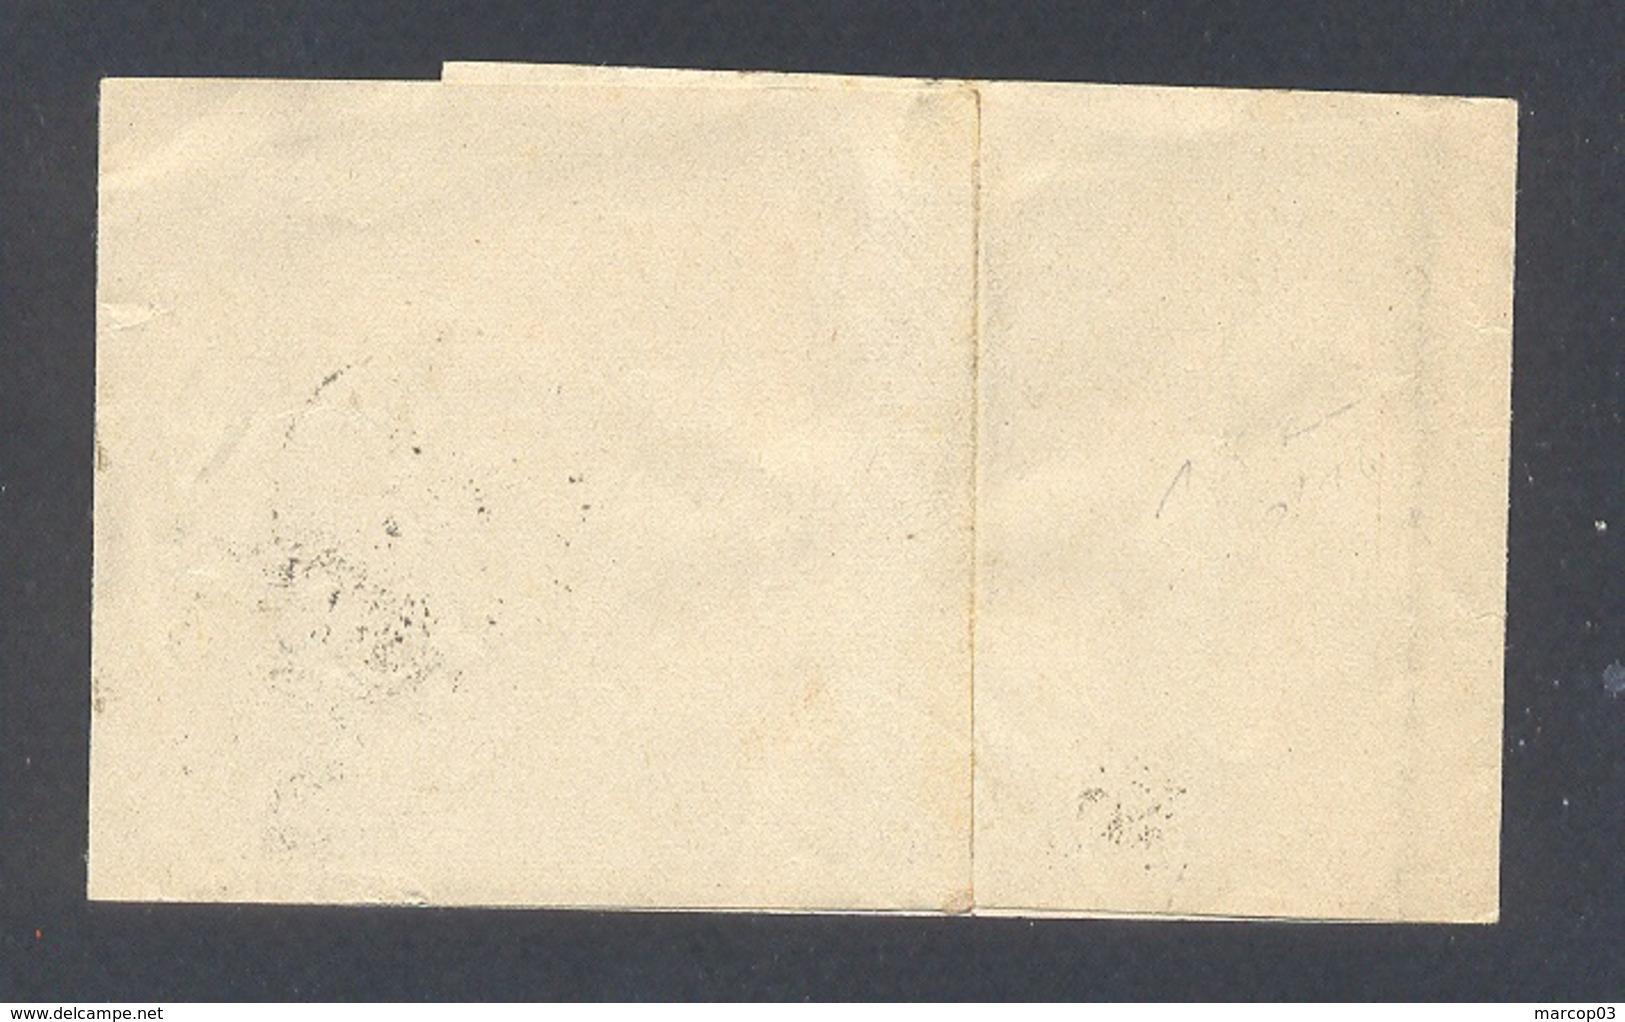 HAUTE PYRENEES 65 LOURDES 2 C Semeuse N° 278 Sur Bande Journal Petite Gironde Du 23/07/1936 TTB - Postmark Collection (Covers)